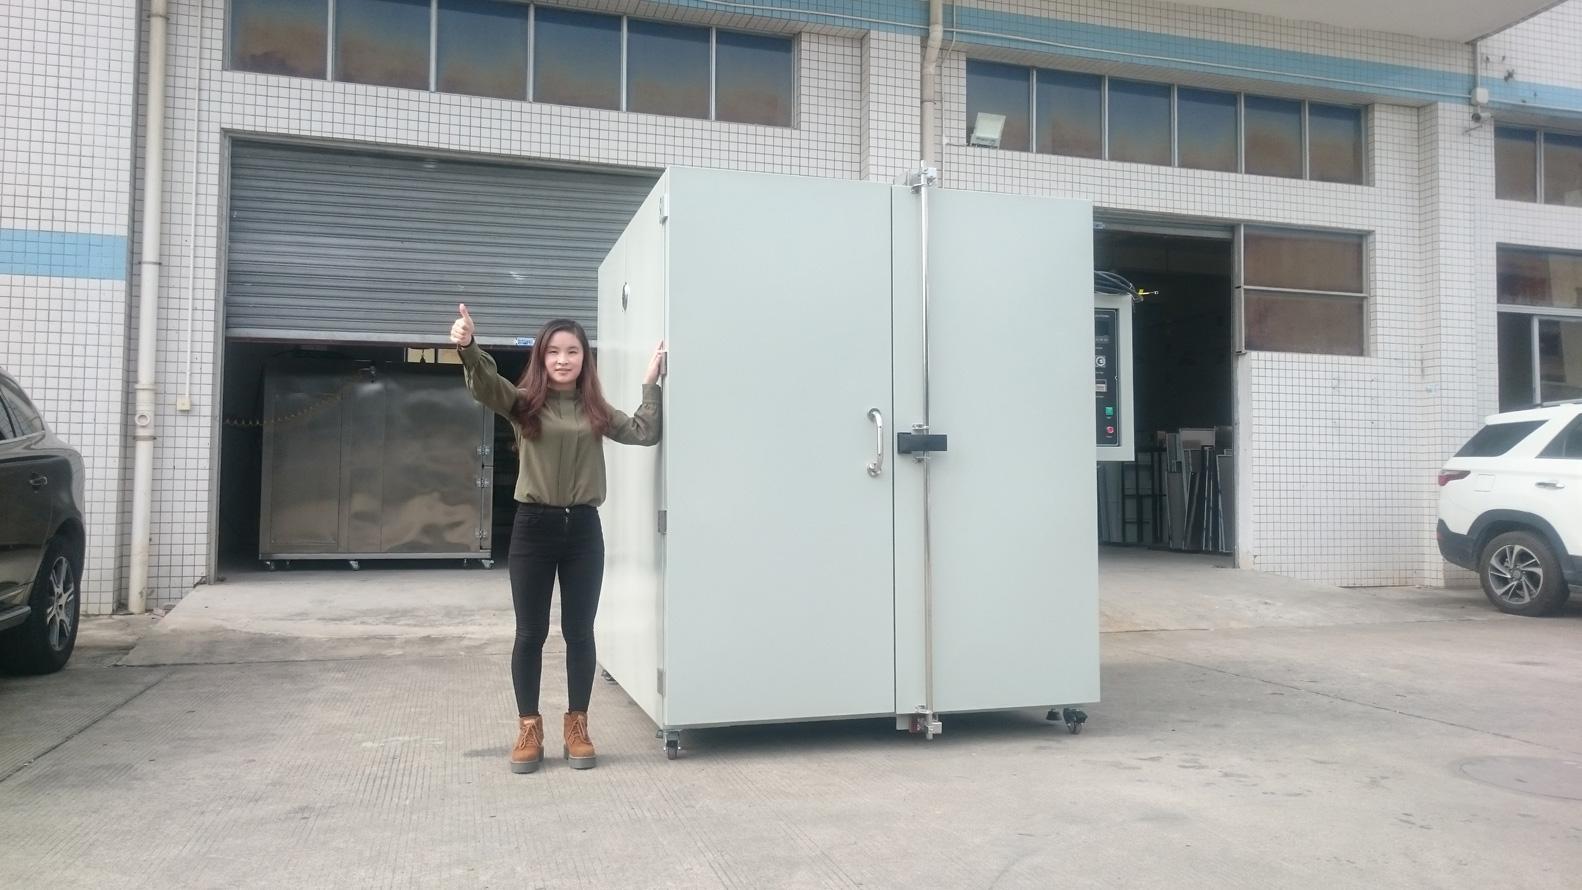 4050 Liters Laboratory Oven